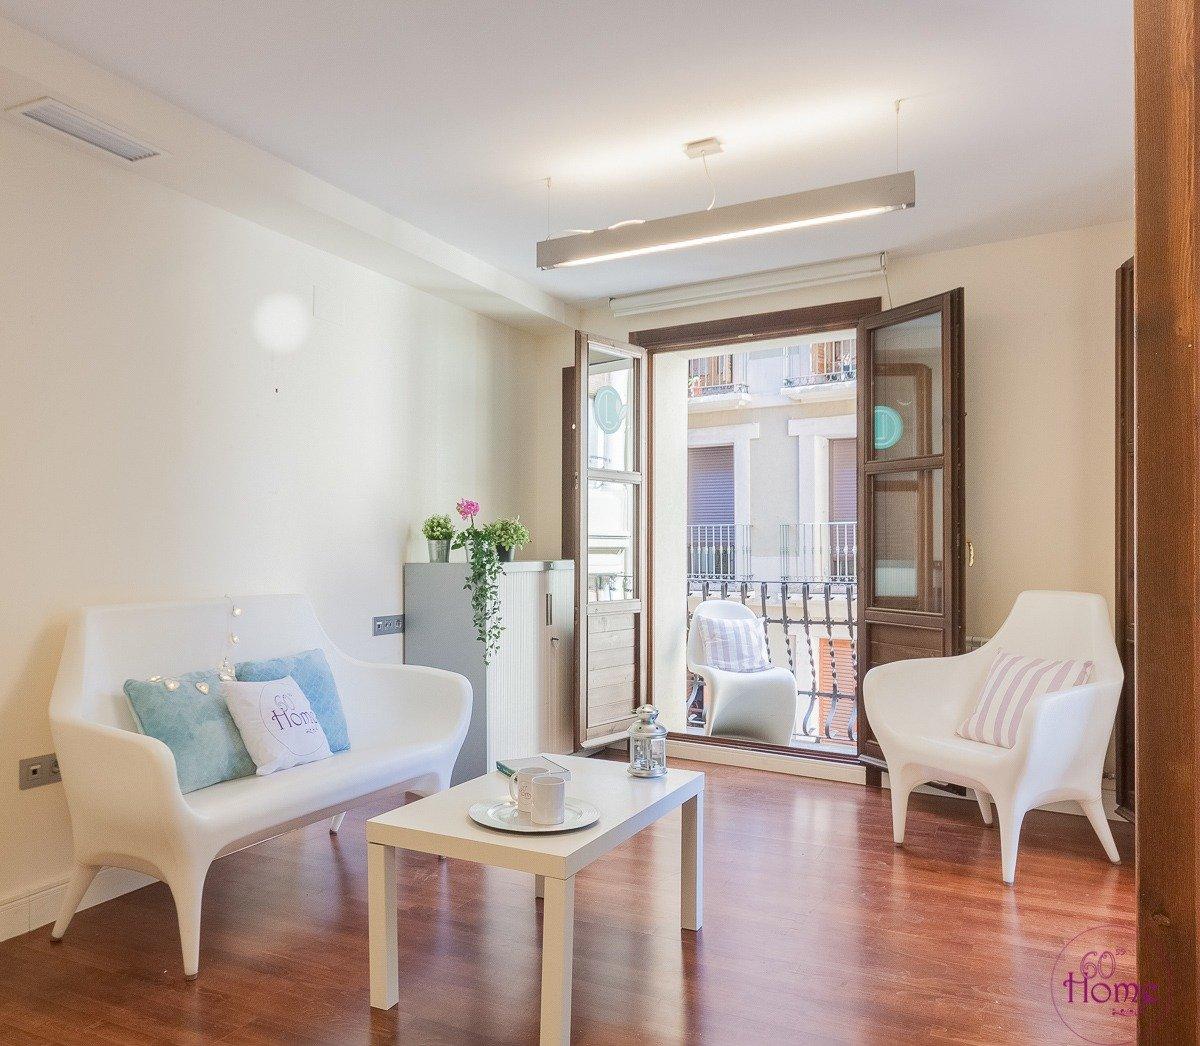 Apartamento, Barbastro, Venta - Barbastro (Huesca)